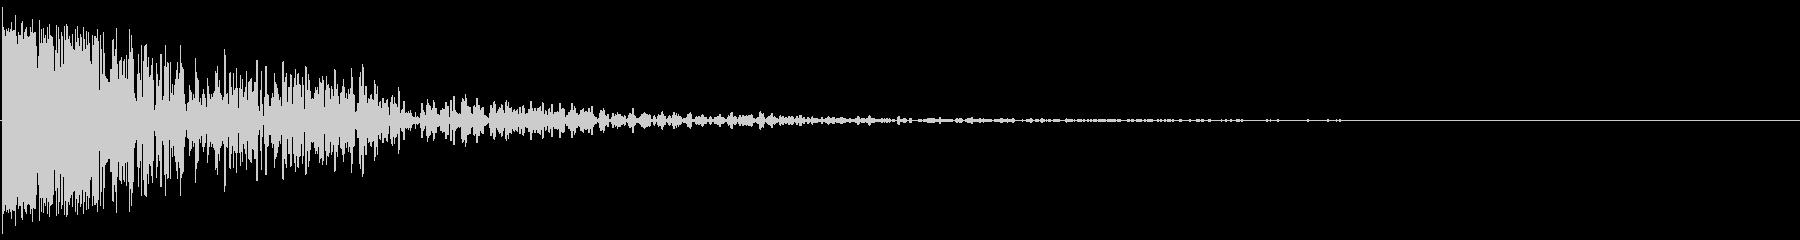 SLEDGEHAMMERがDUMP...の未再生の波形